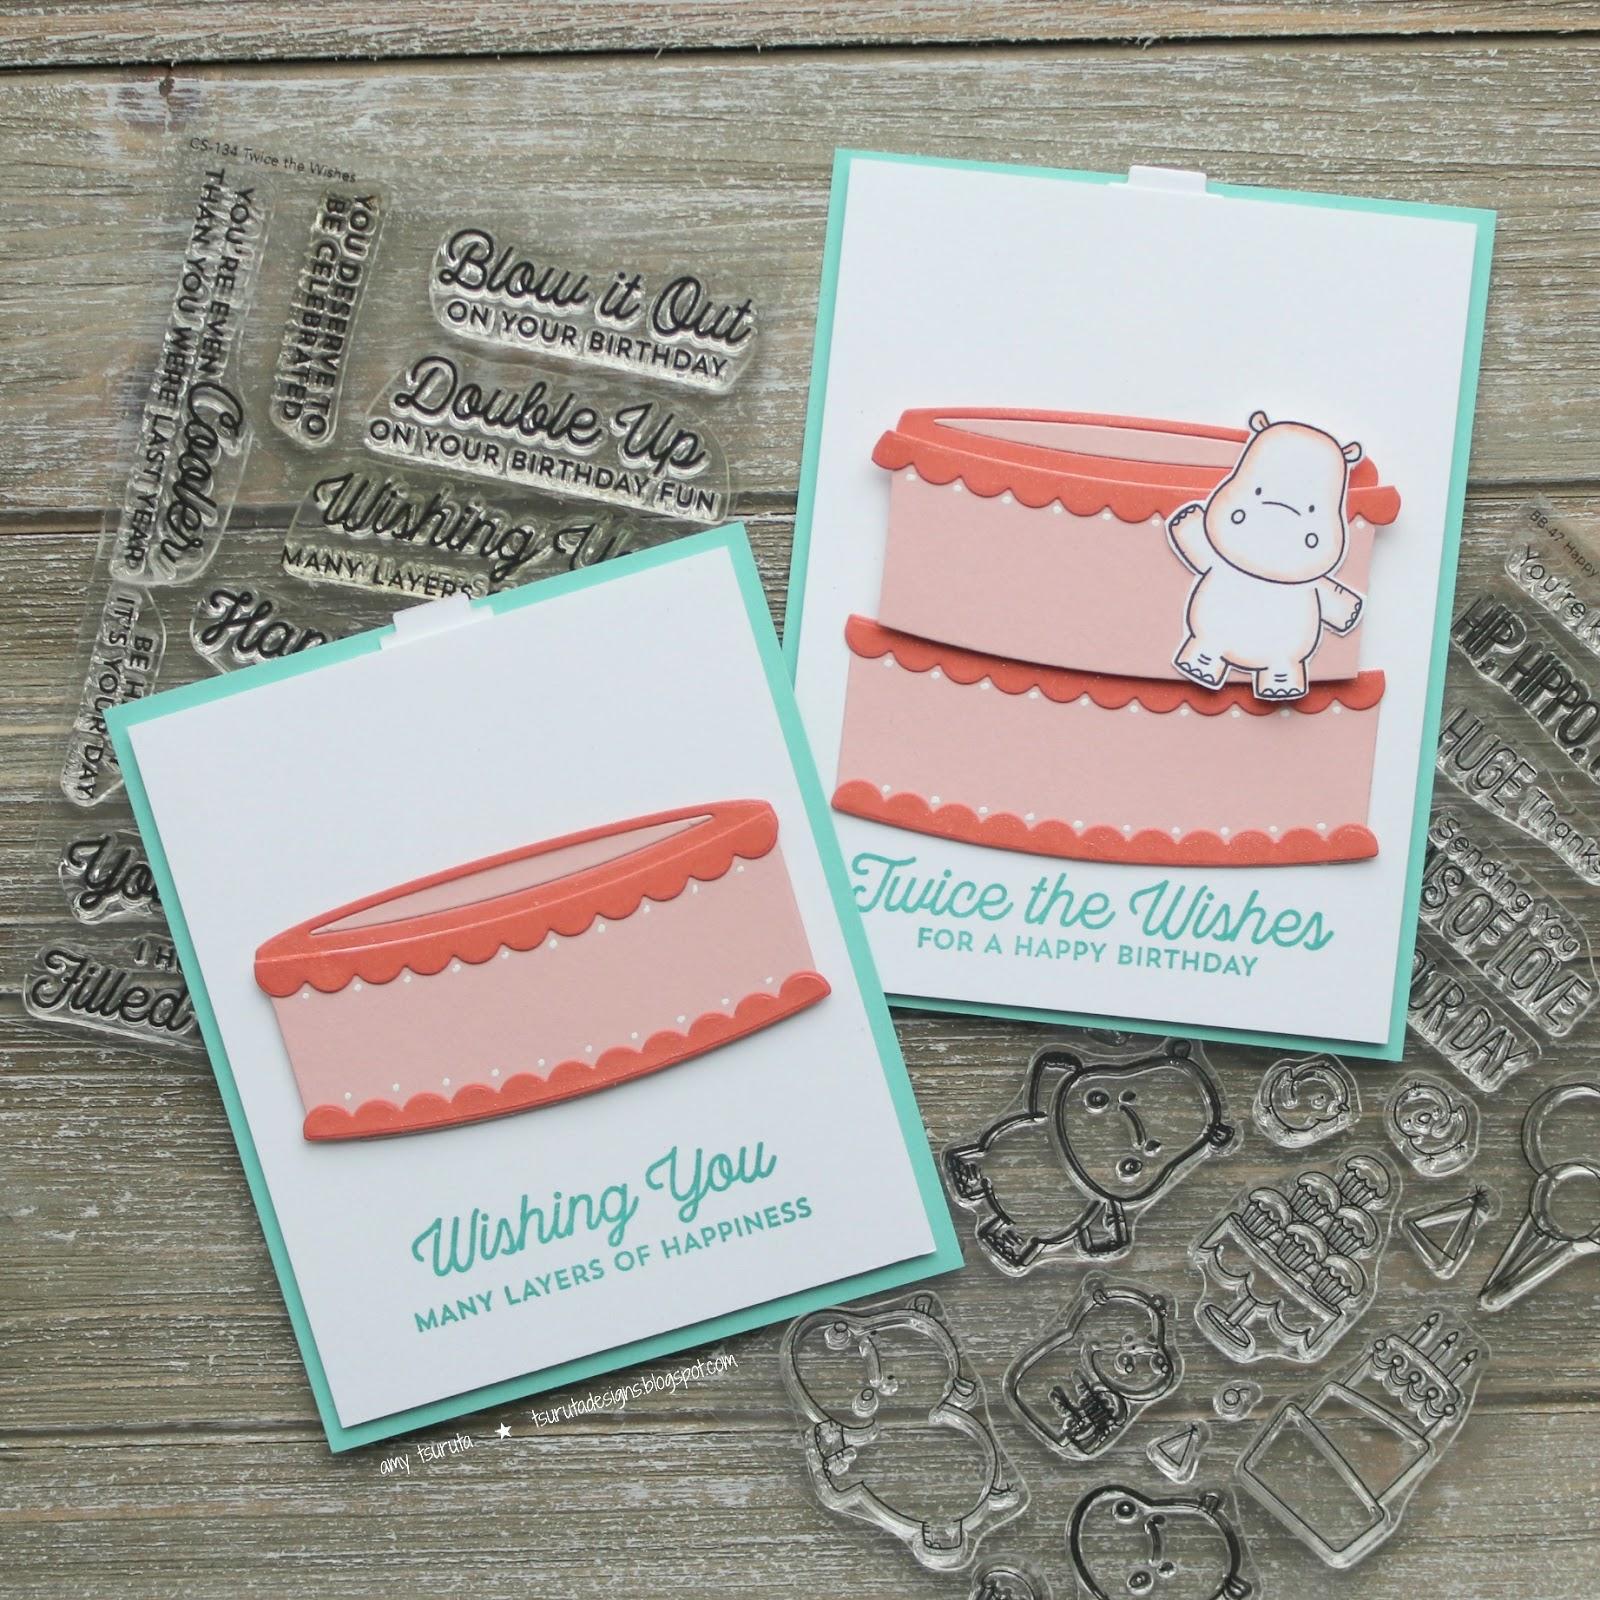 Pleasant Tsuruta Designs Interactive Birthday Cake My Favorite Things Funny Birthday Cards Online Inifofree Goldxyz